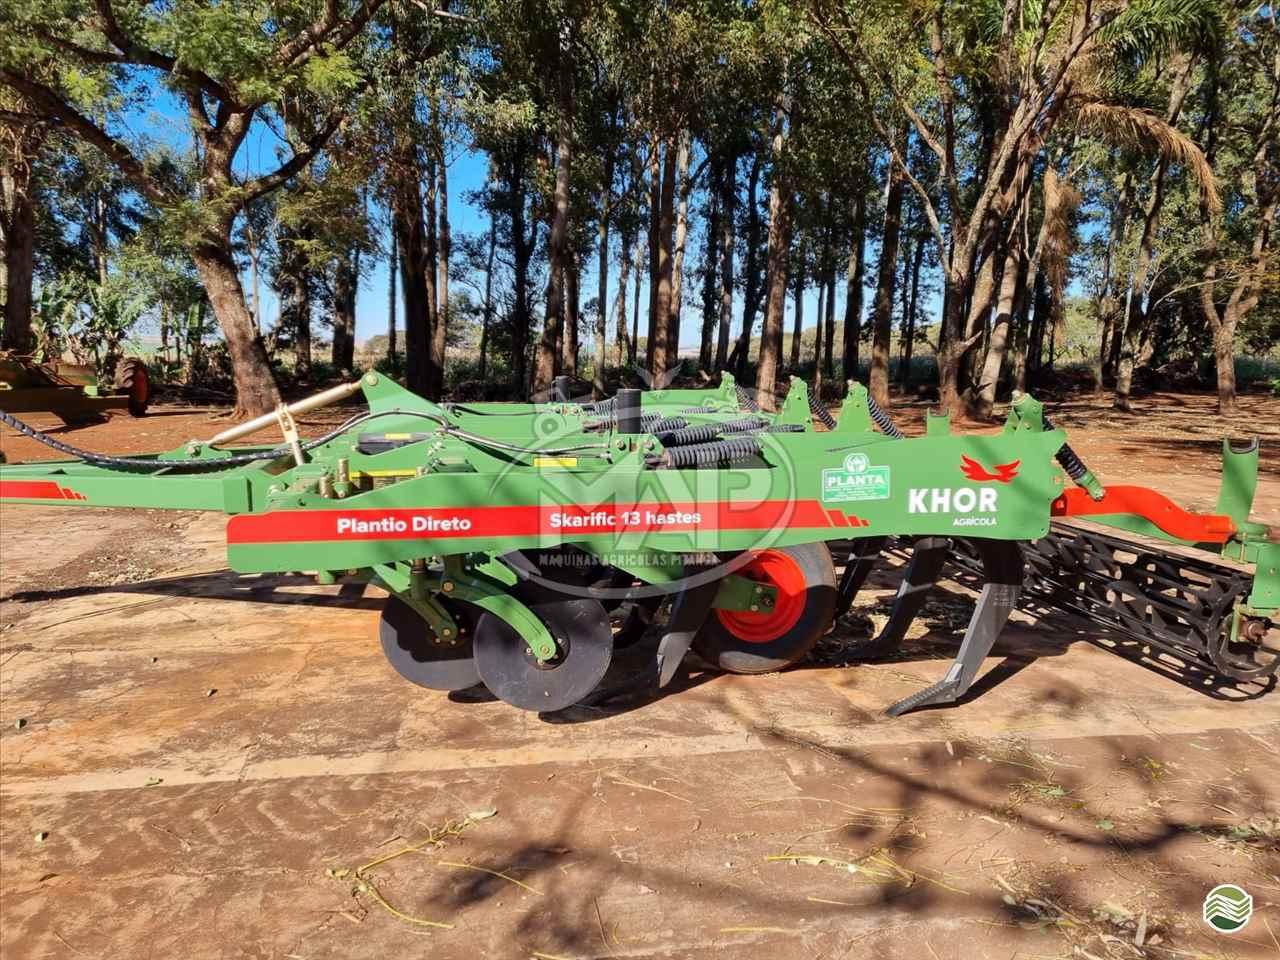 IMPLEMENTOS AGRICOLAS ESCARIFICADOR 13 HASTES DISCO CORTE Máquinas Agrícolas Pitanga PITANGA PARANÁ PR